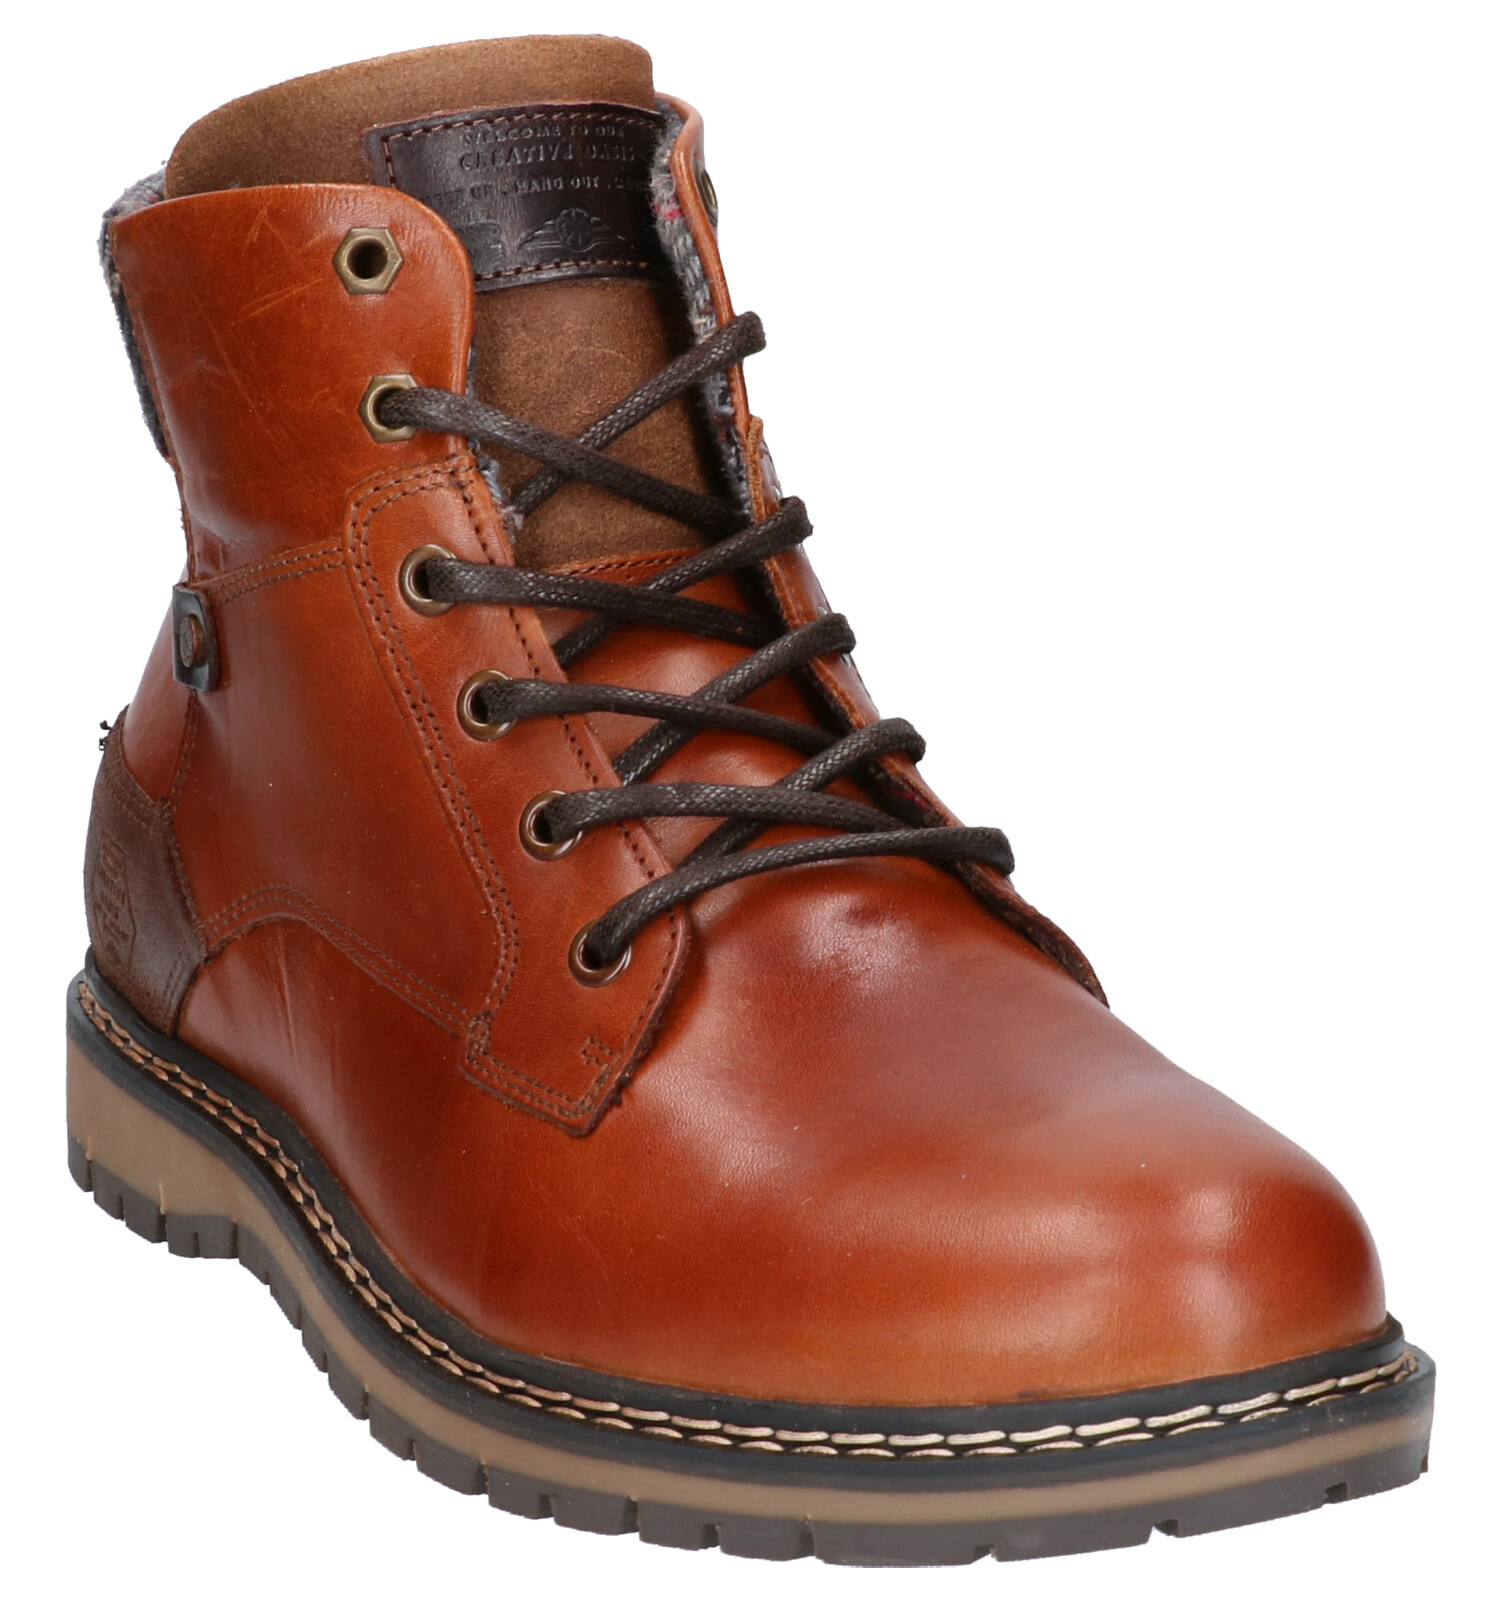 Boots Cognac Bullboxer Boots Bullboxer Boots Bullboxer Cognac Cognac D2HEI9